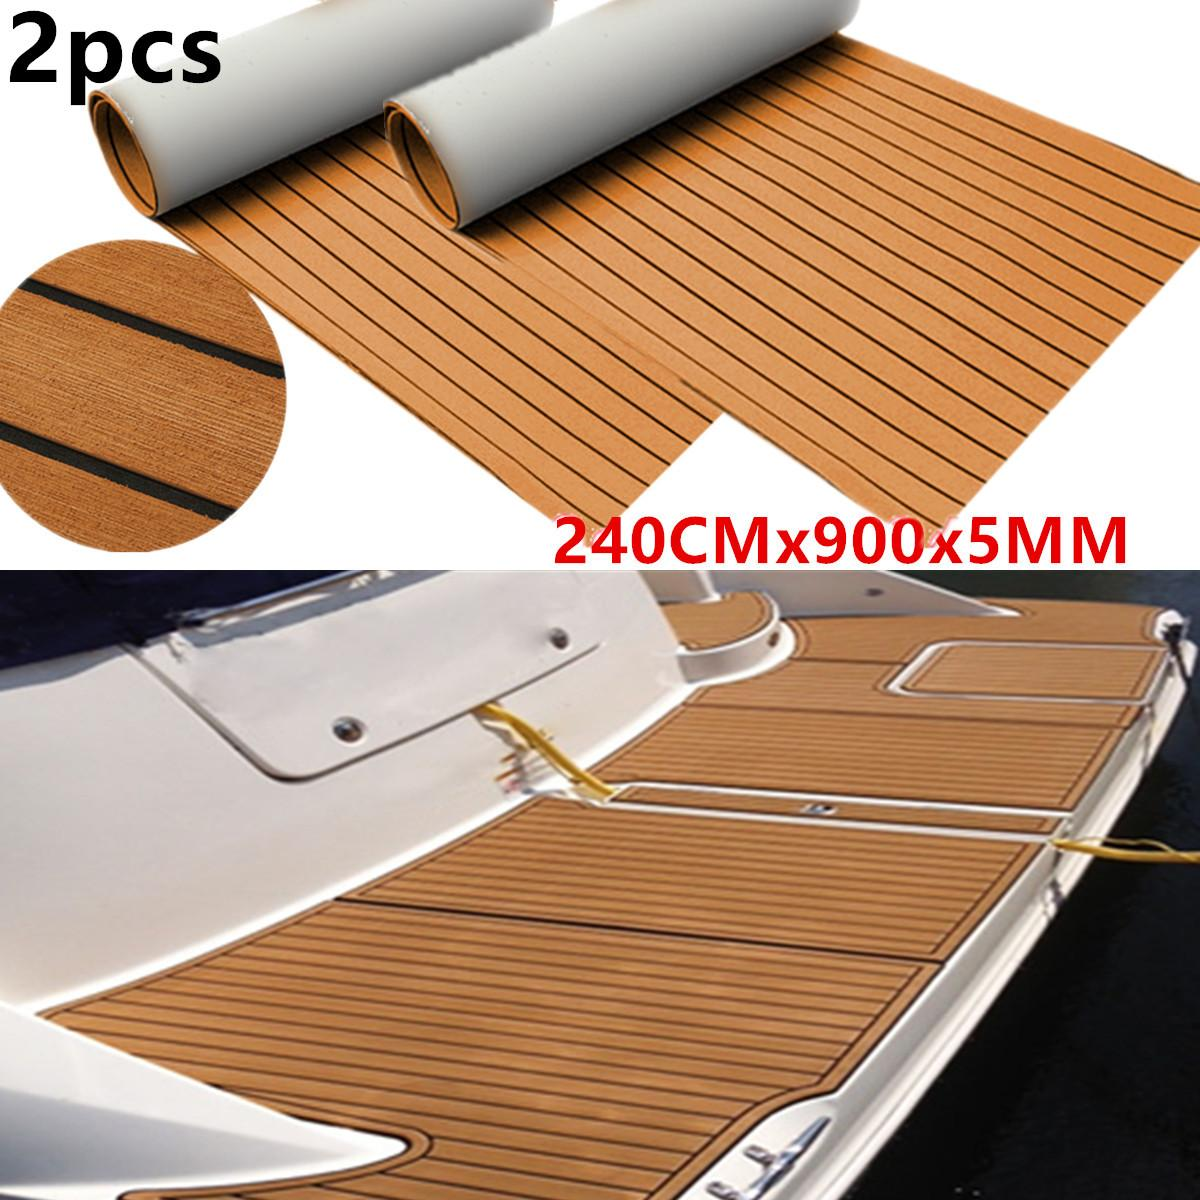 2Pcs 900x2400x5mm EVA Foam Imitated Teak Boat Deck Mat Brown Yacht Flooring Anti Slip Waterproof Mat Recreational Vehicle Pad